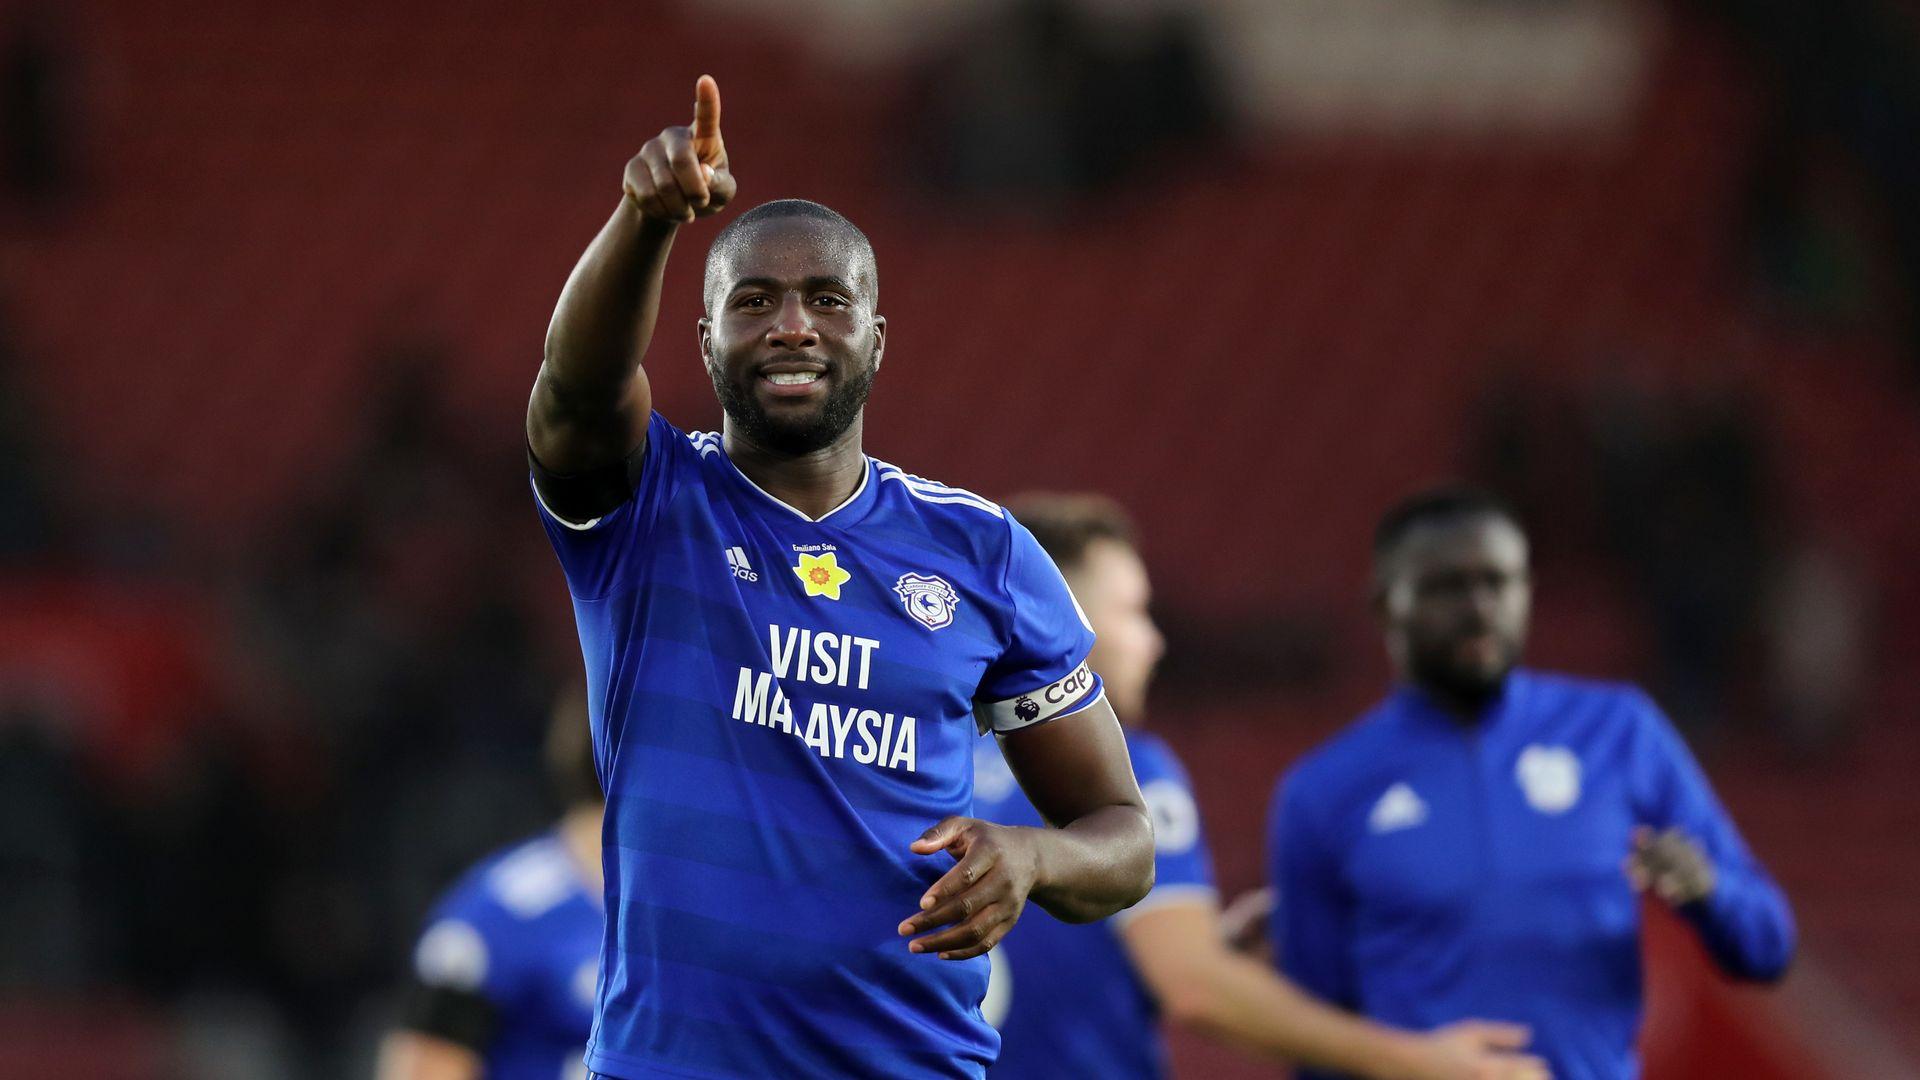 Bamba bullish ahead of restart against old club Leeds